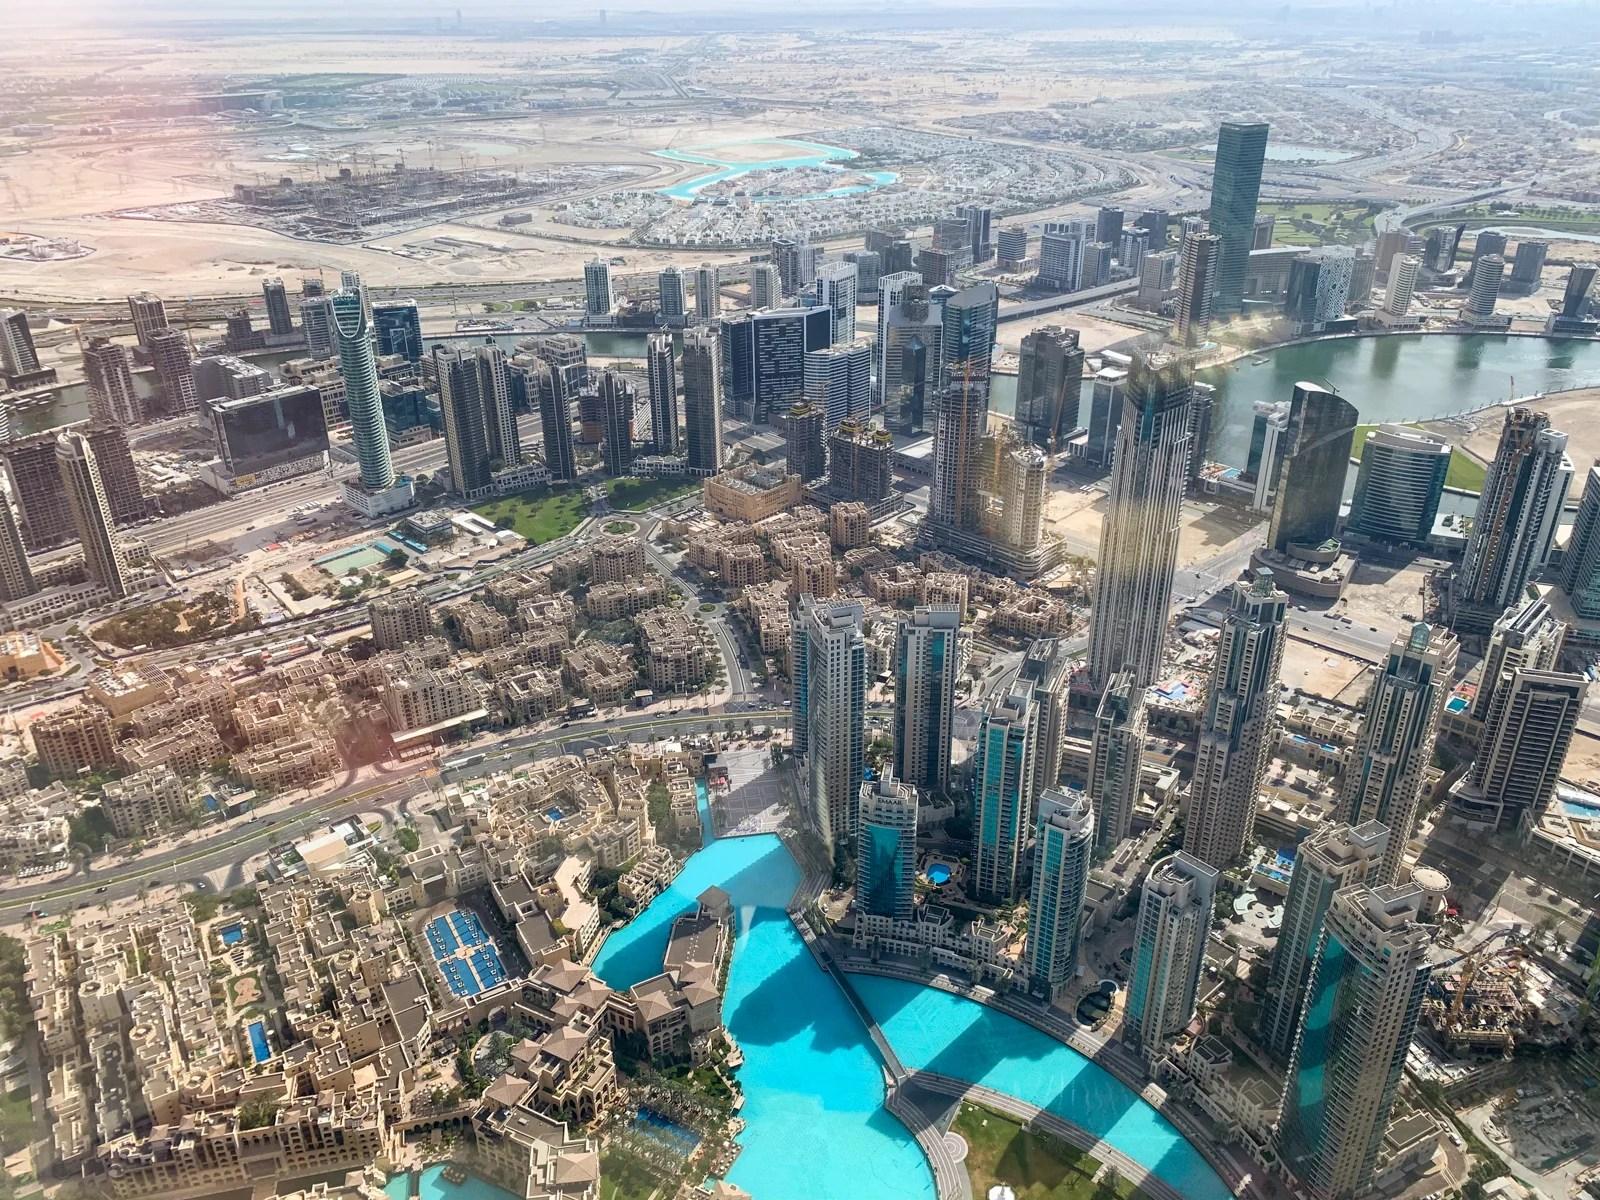 Dining at At mosphere Atop the Burj Khalifa in Dubai